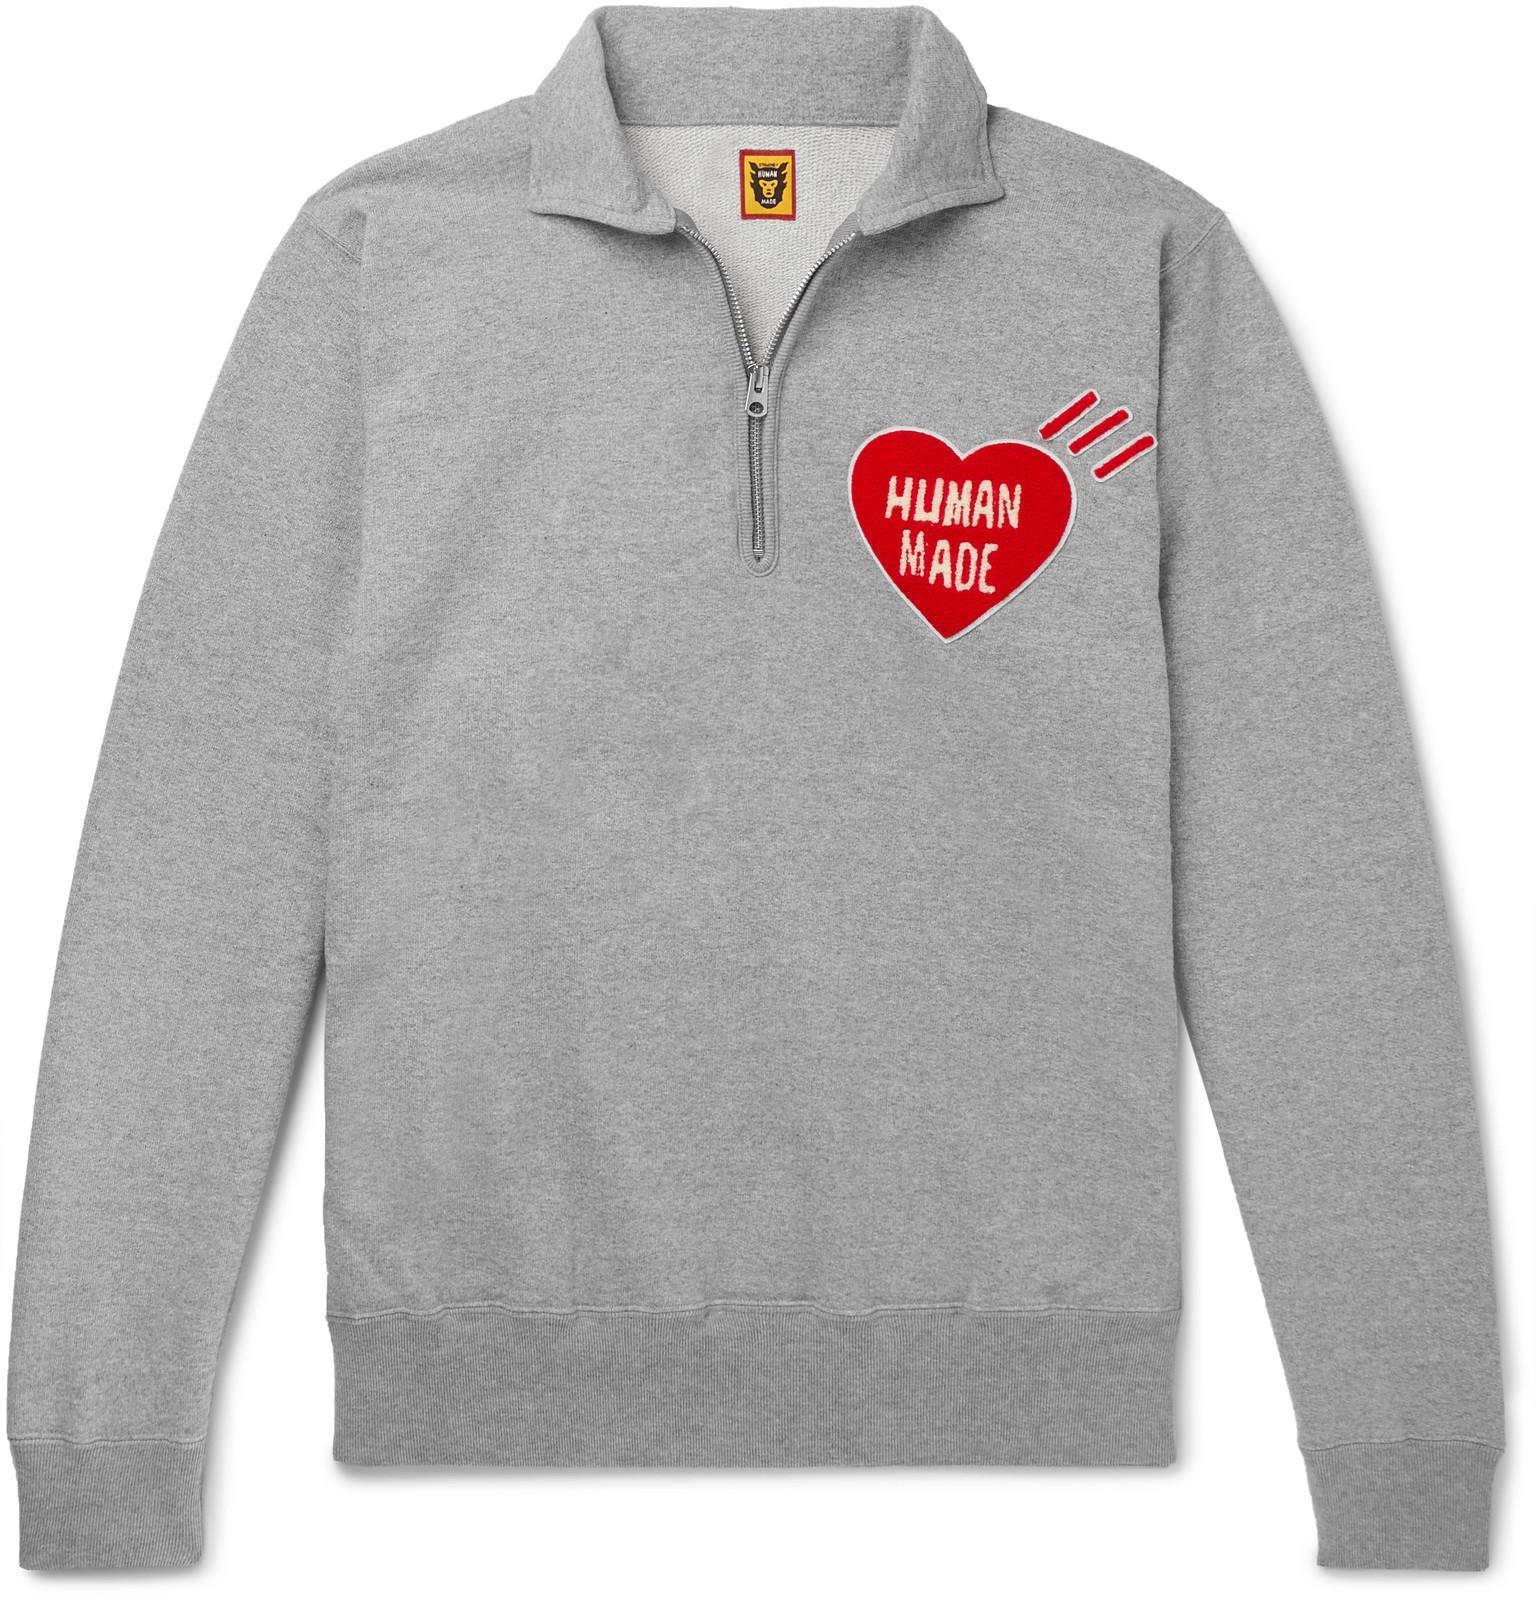 351df663b429a Human Made - Gray Zip Sweatshirt for Men - Lyst. View fullscreen